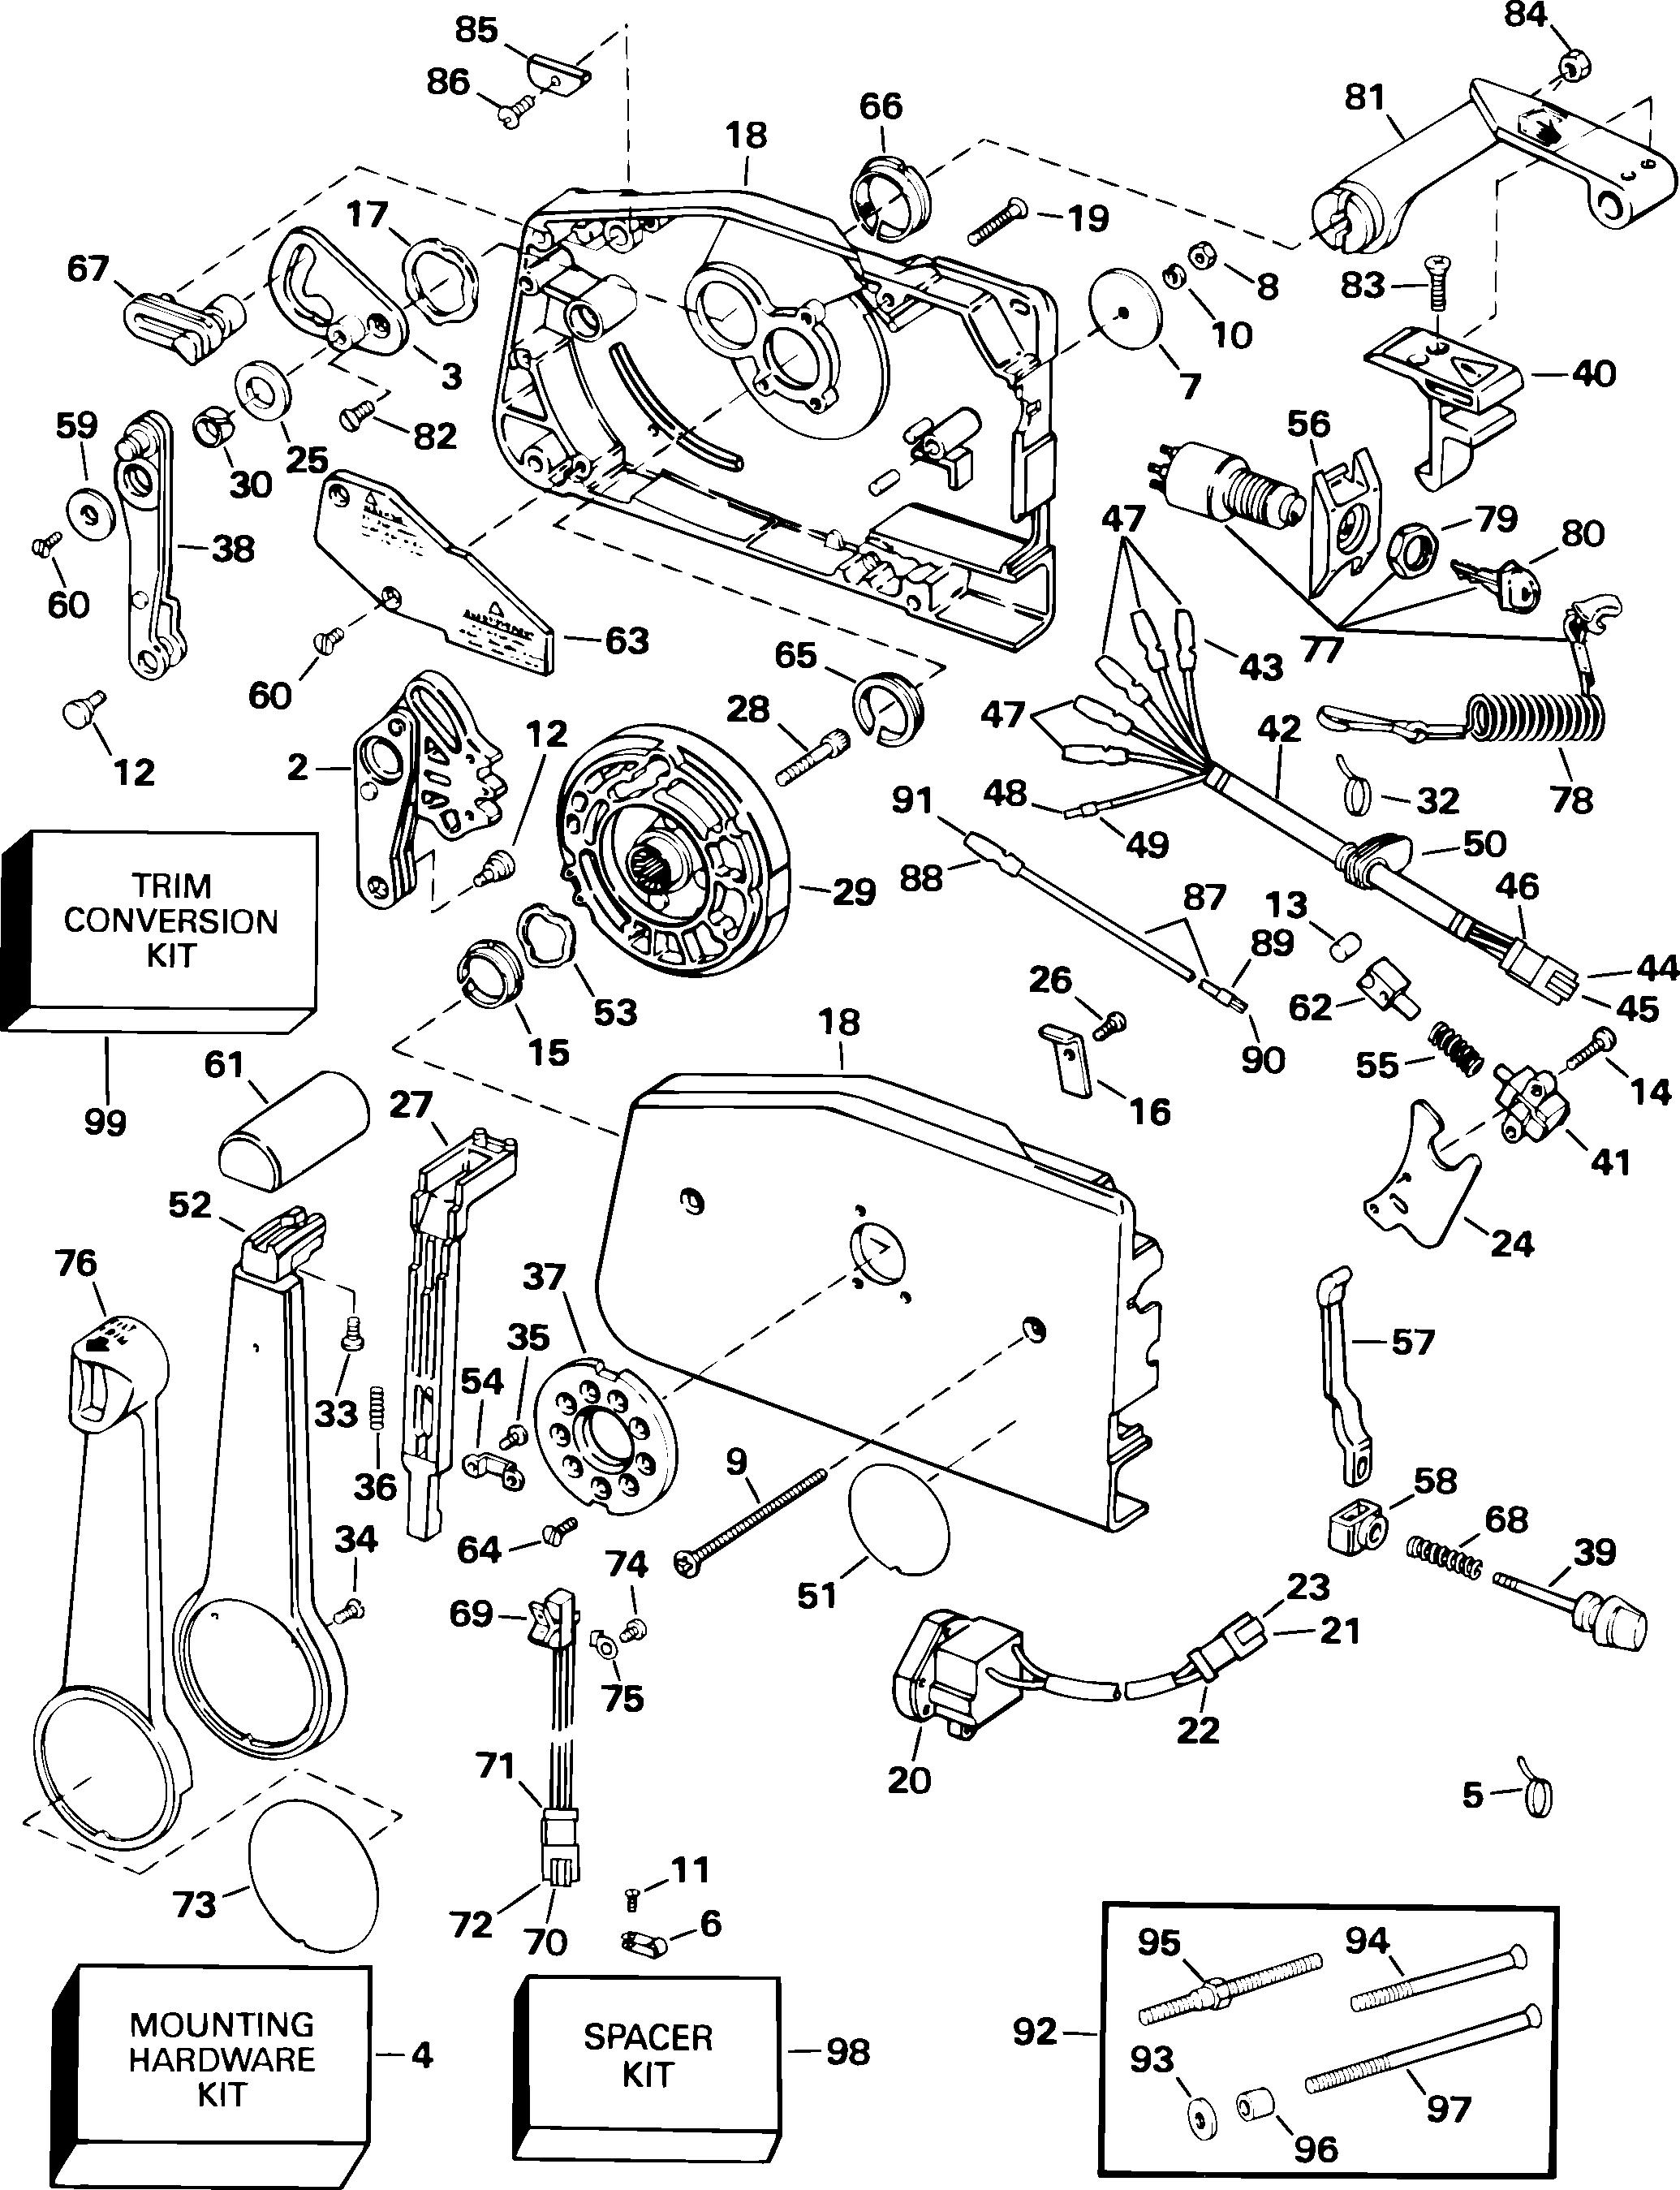 Remote control side mount key switch remote controls cables mercury remote control wiring diagram mercury control box diagram